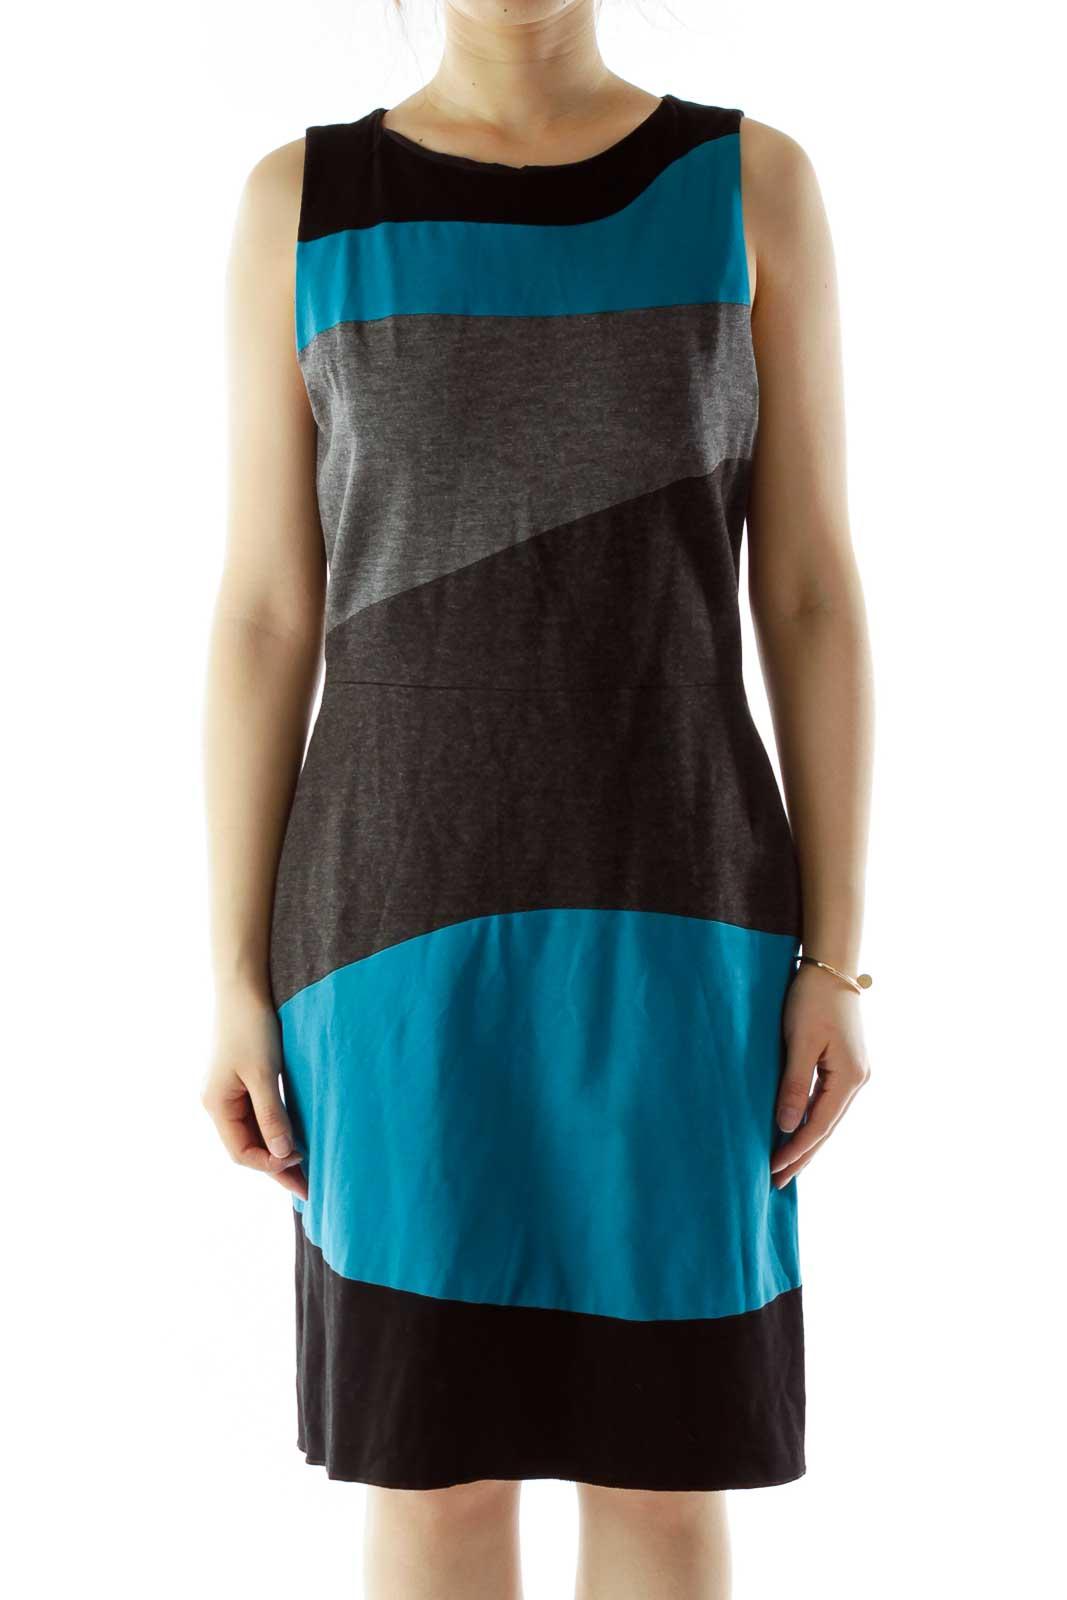 Black Gray Blue Color Block Work Dress Front